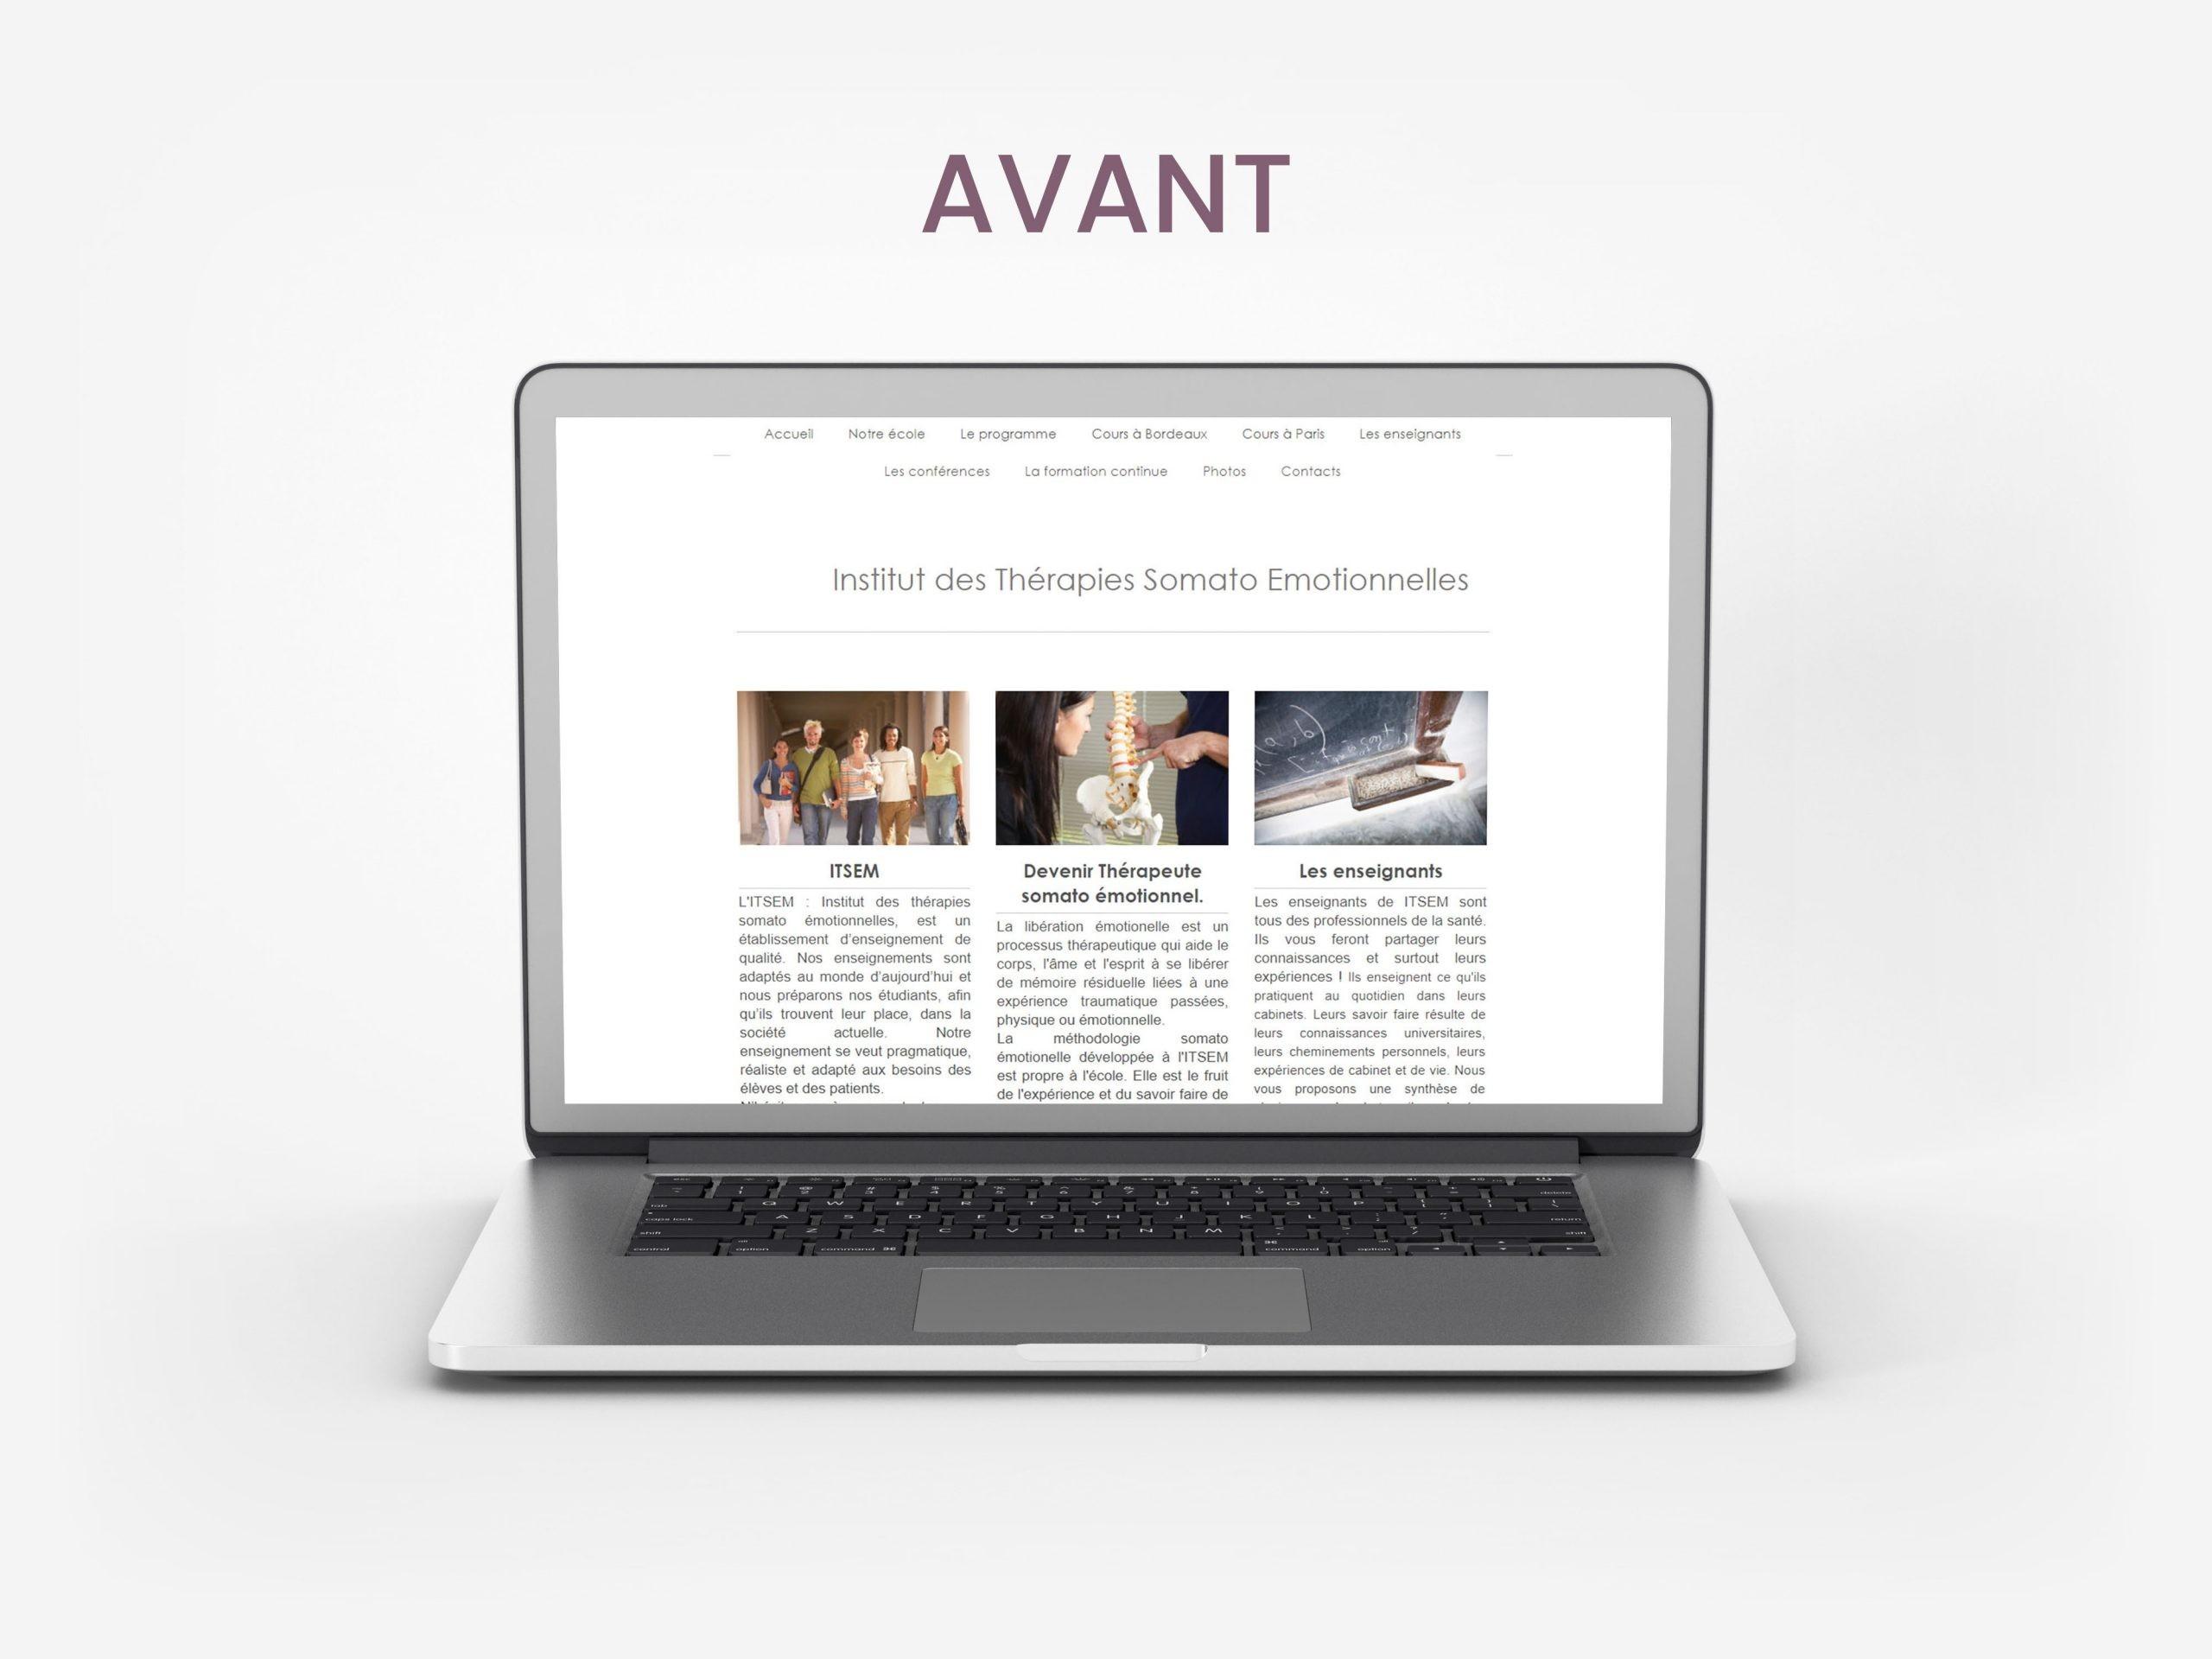 webdesign-itsem-avant